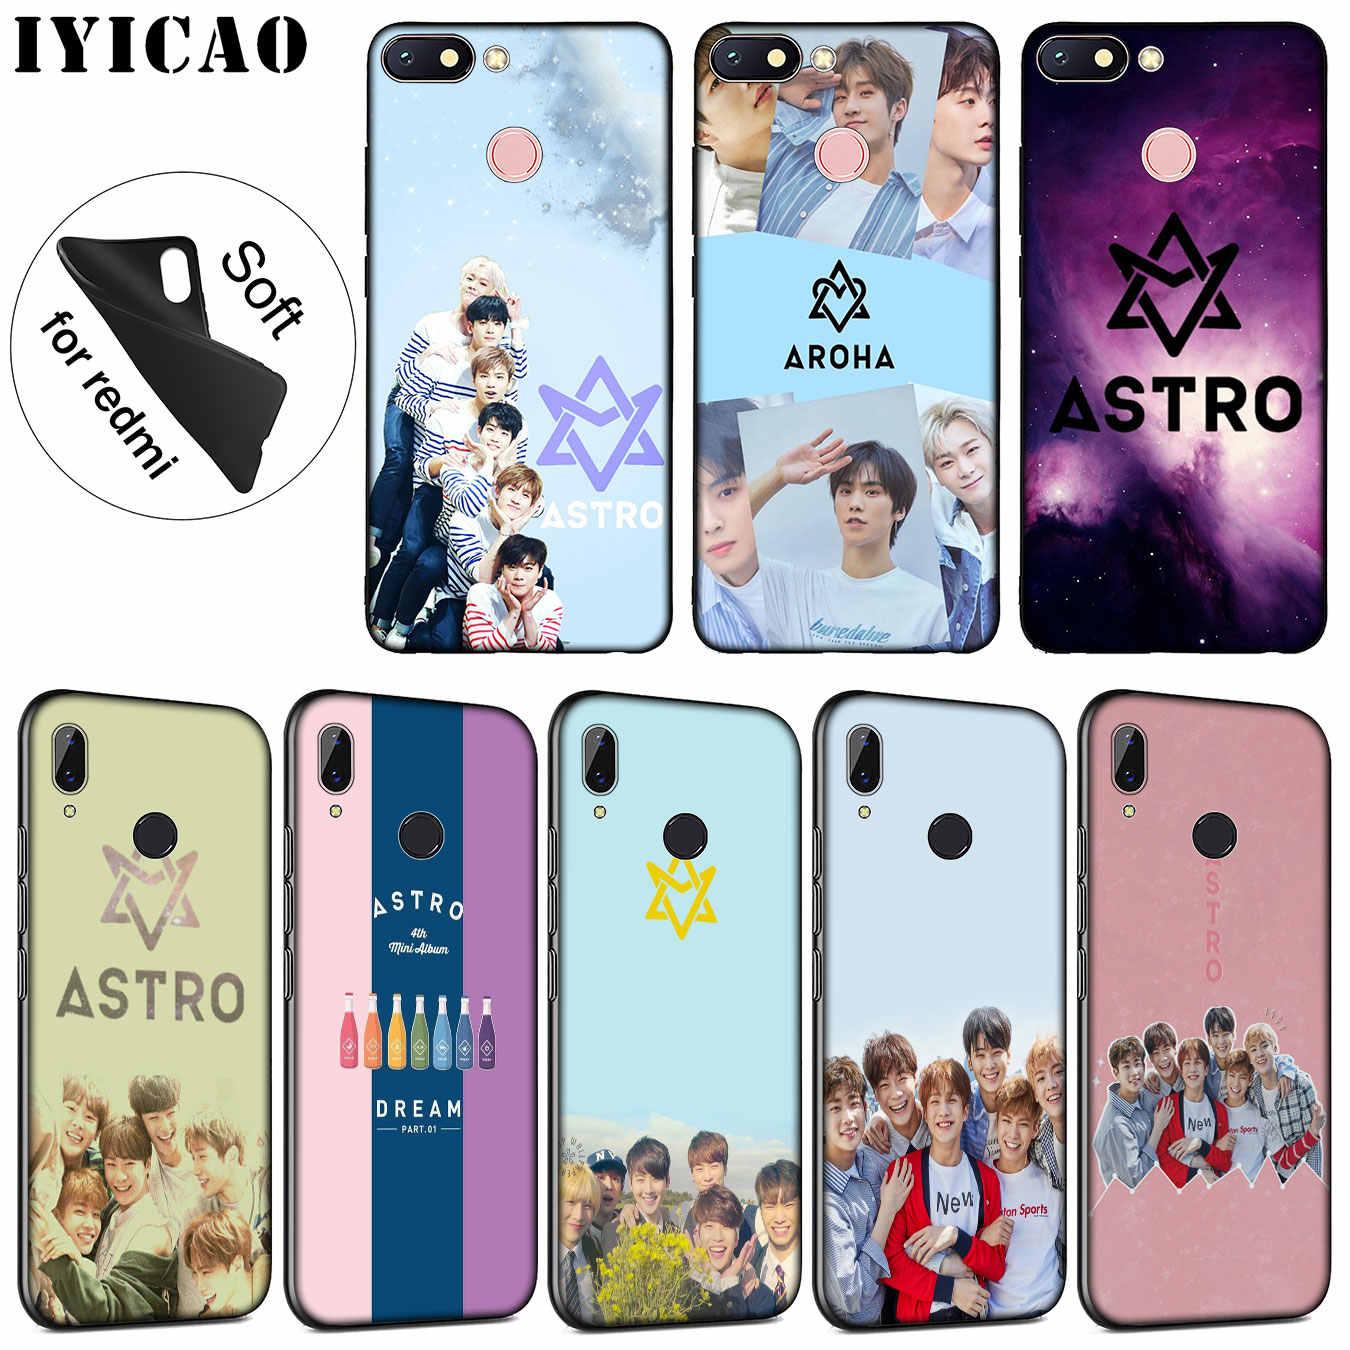 Iyicao Astro Soft Silicone Phone Case For Xiaomi Redmi K30 K20 8a